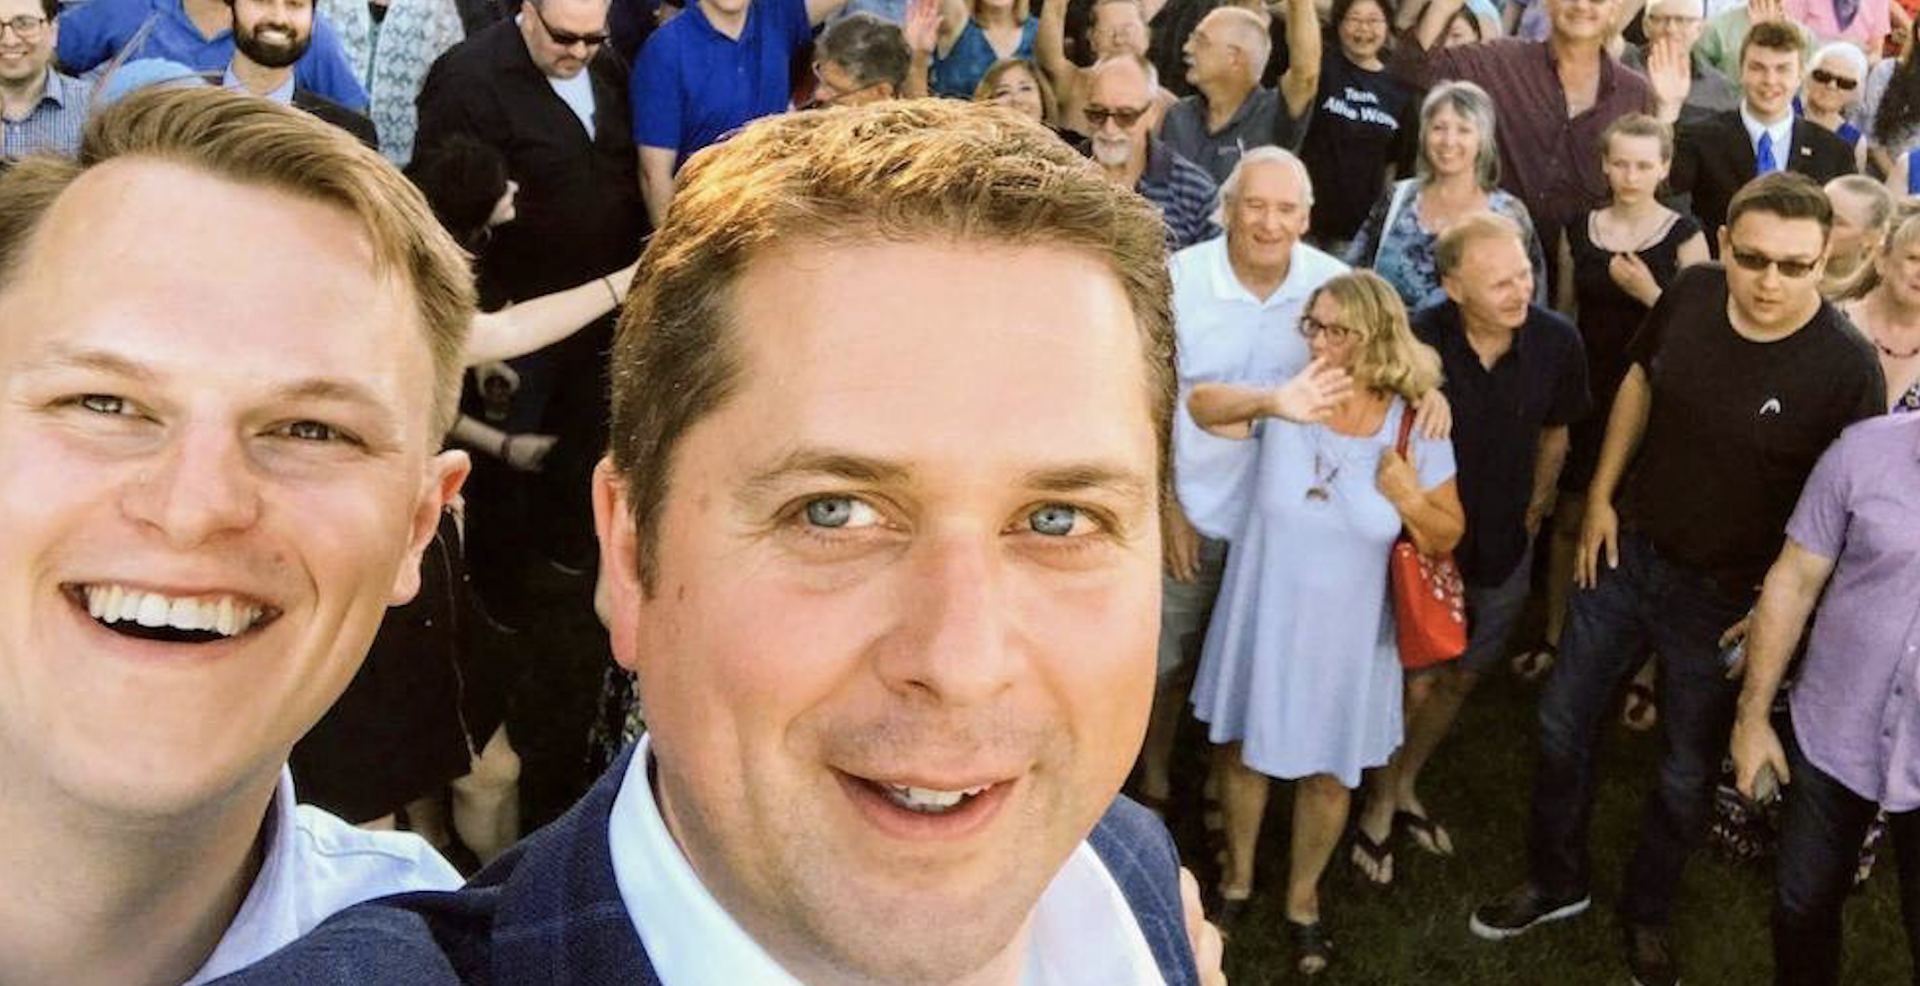 Fresh faces in Ottawa: Meet 35-year-old MP Brad Vis